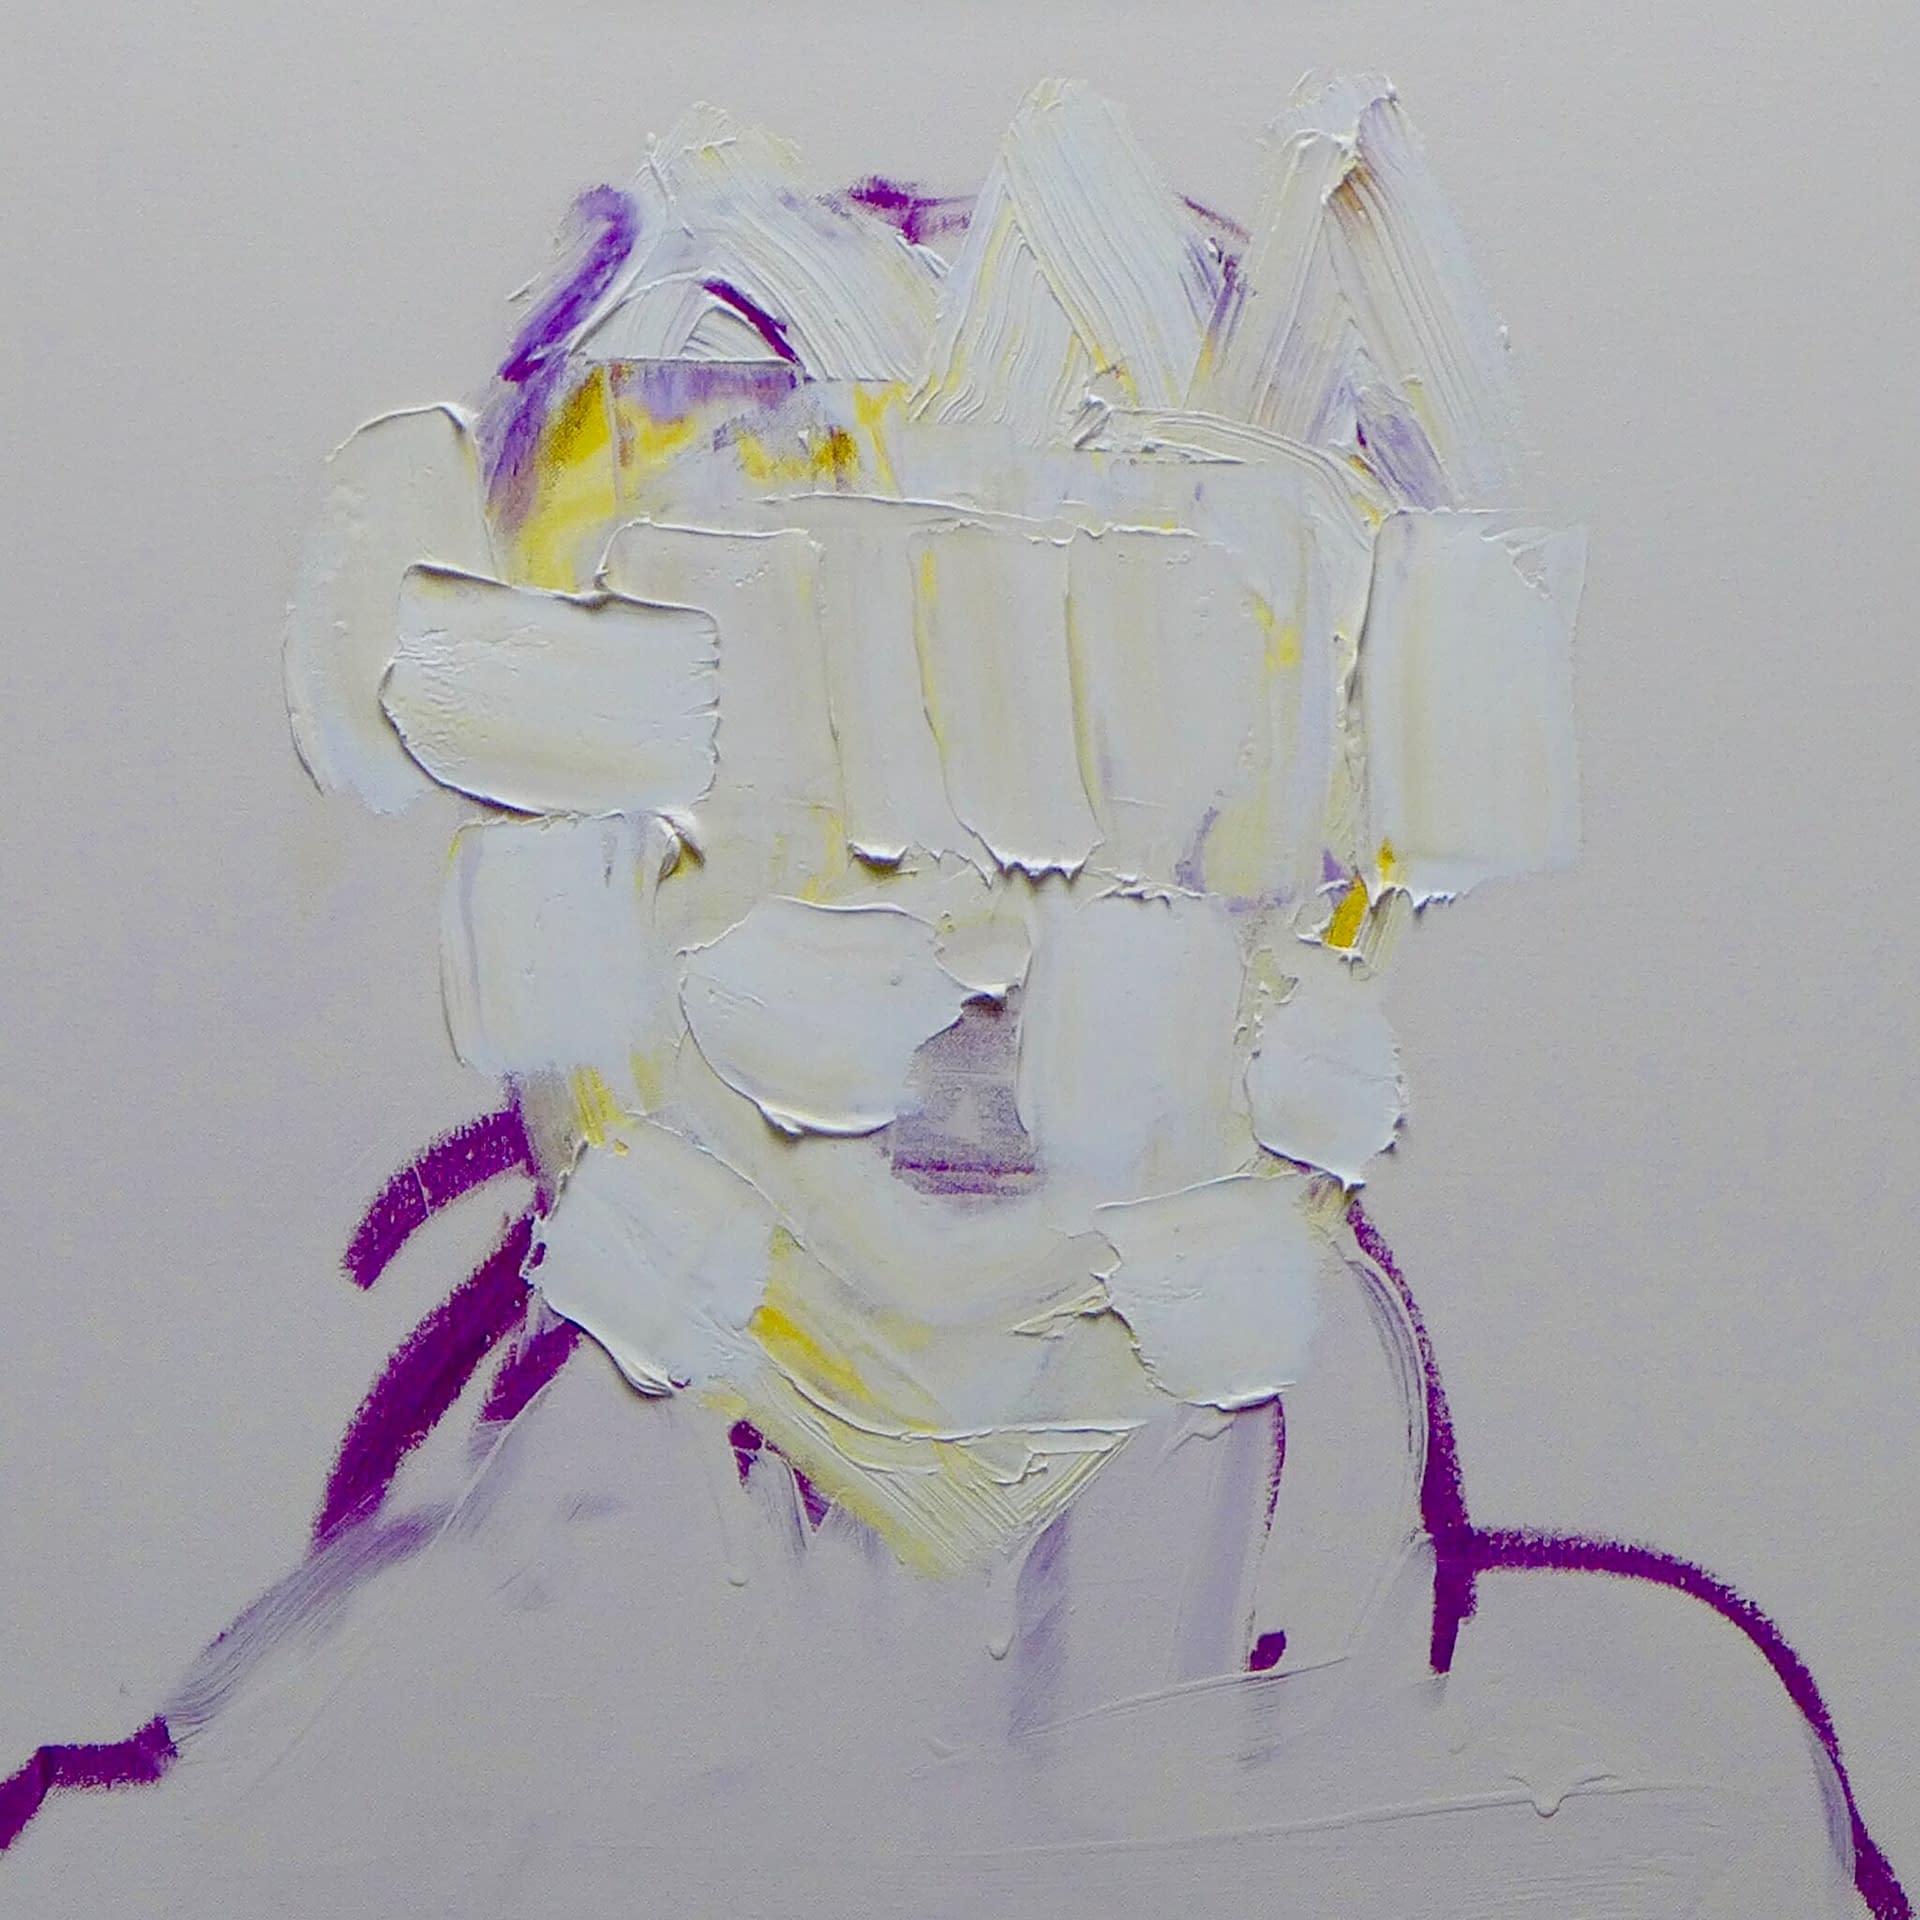 1. Rammellzee 24x24 oil on canvas